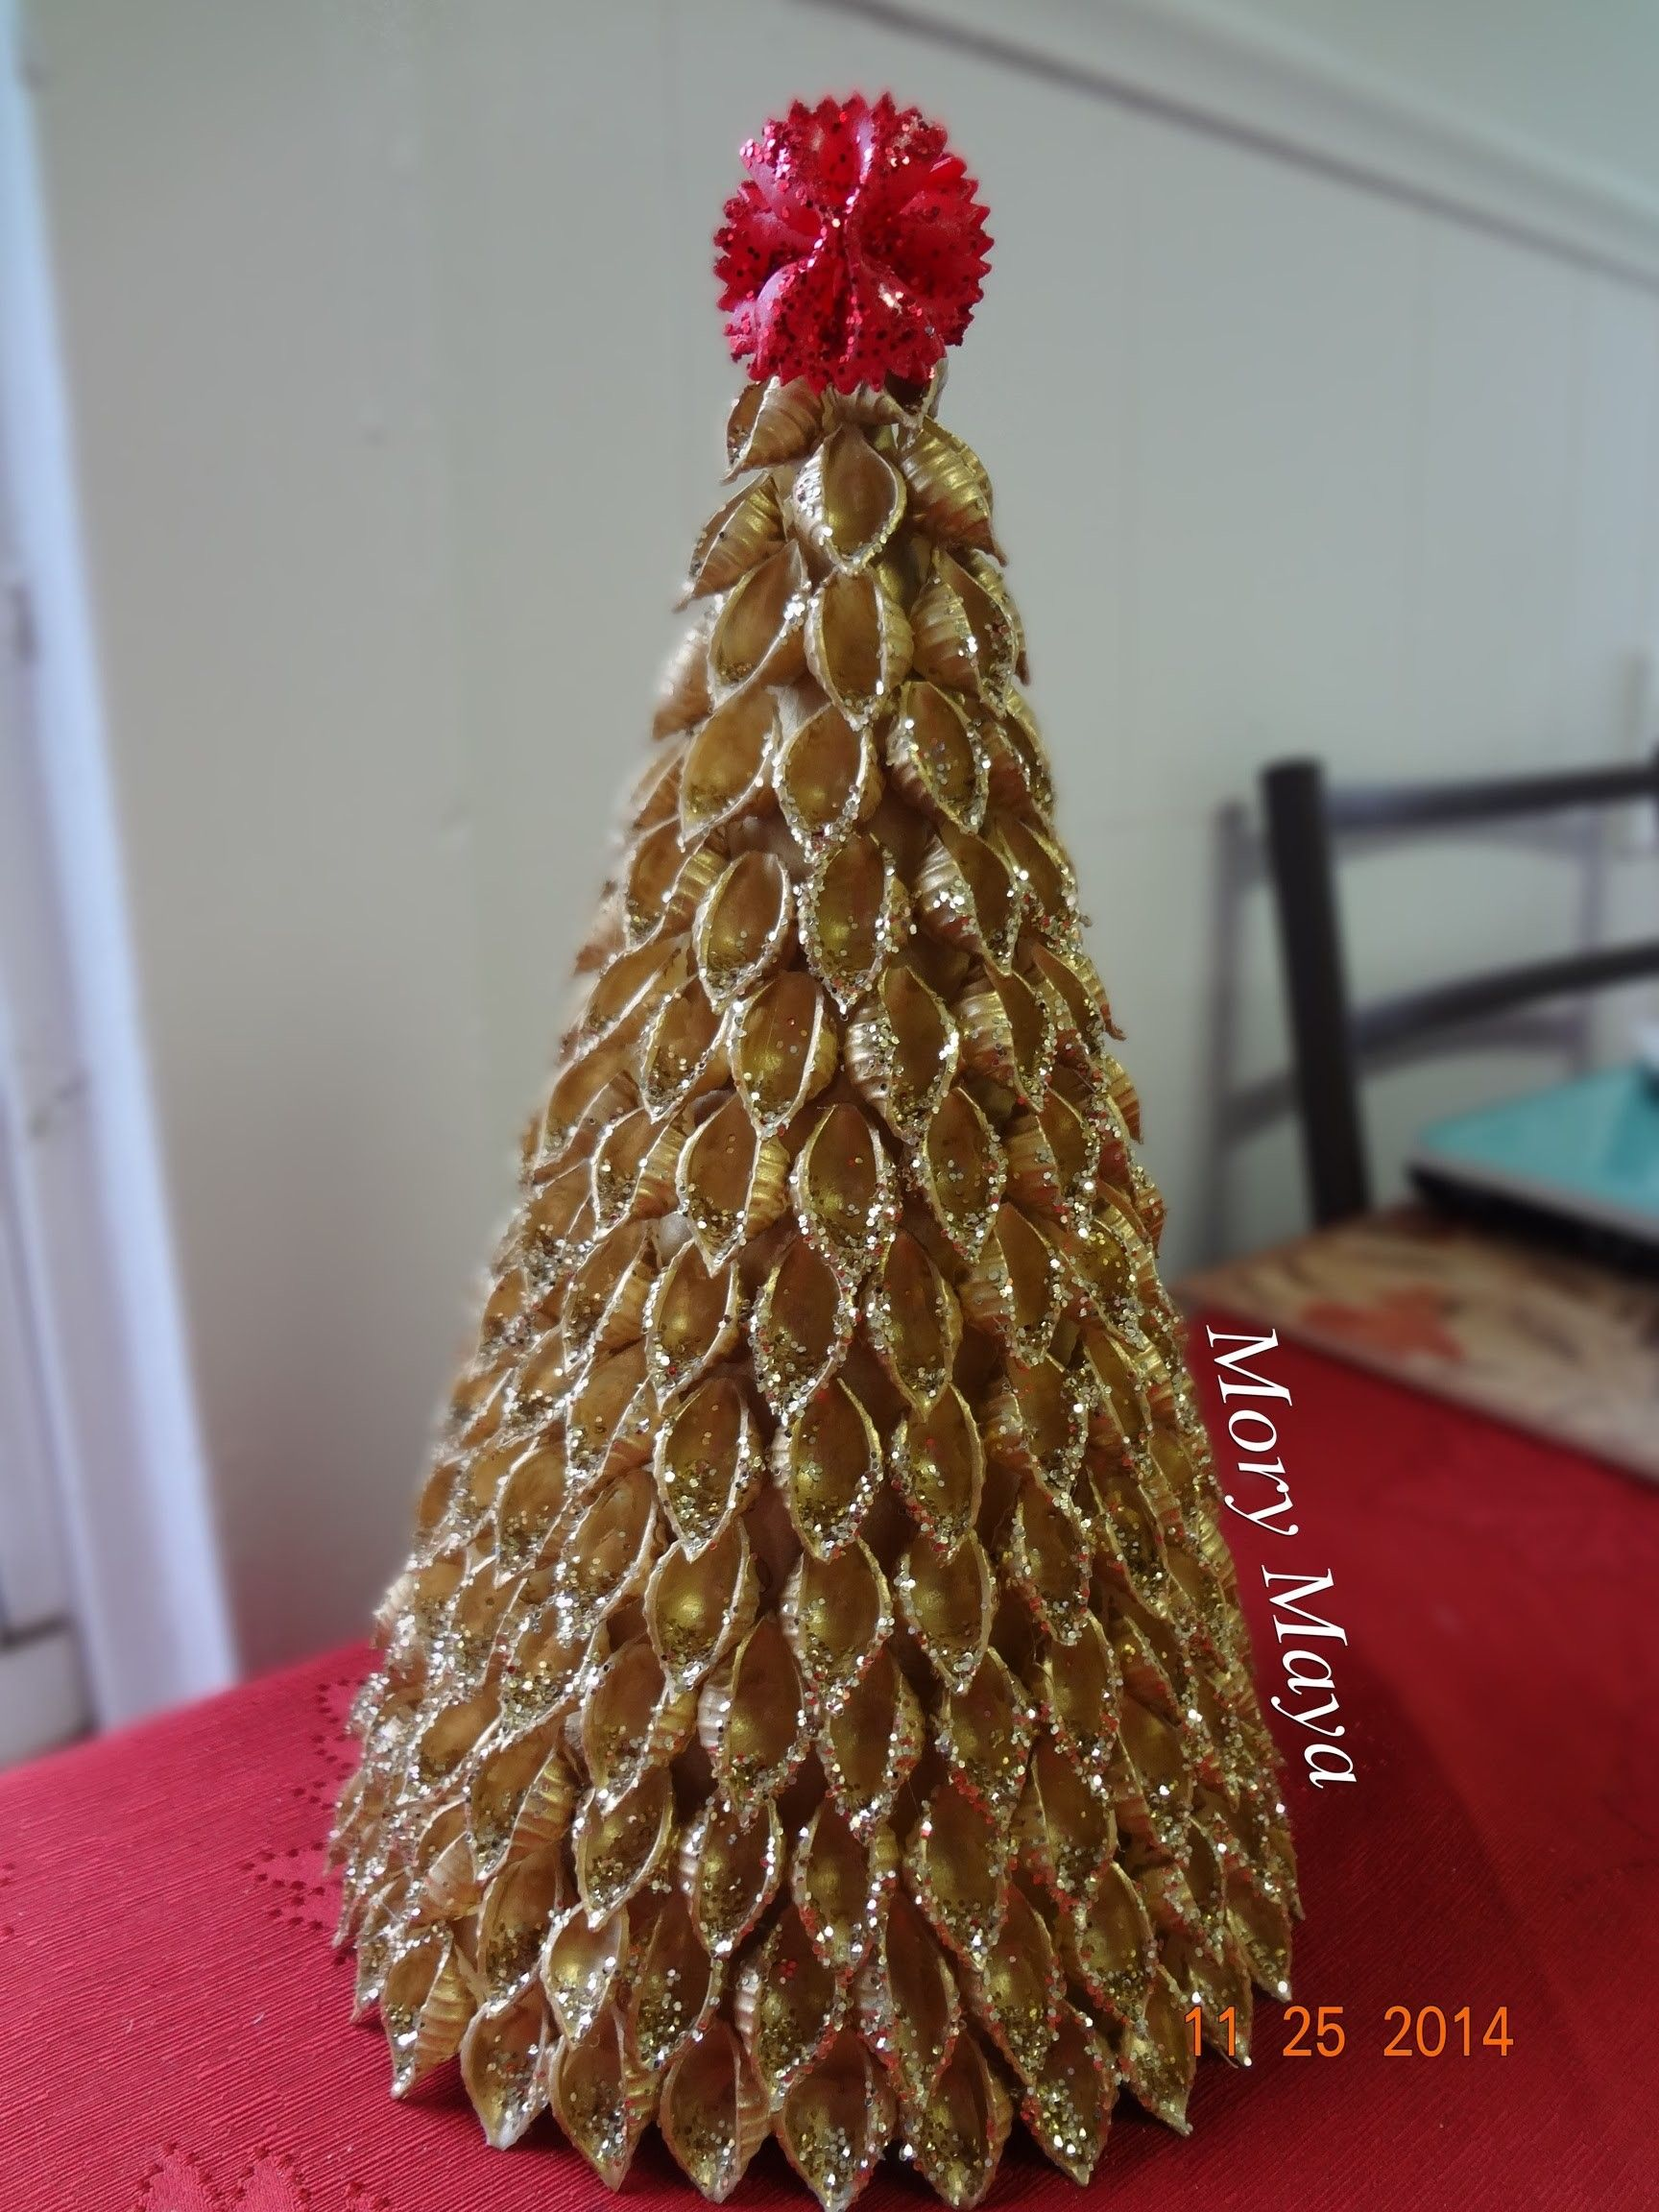 o hacer un arbol navide±o con pasta manualidades DIY